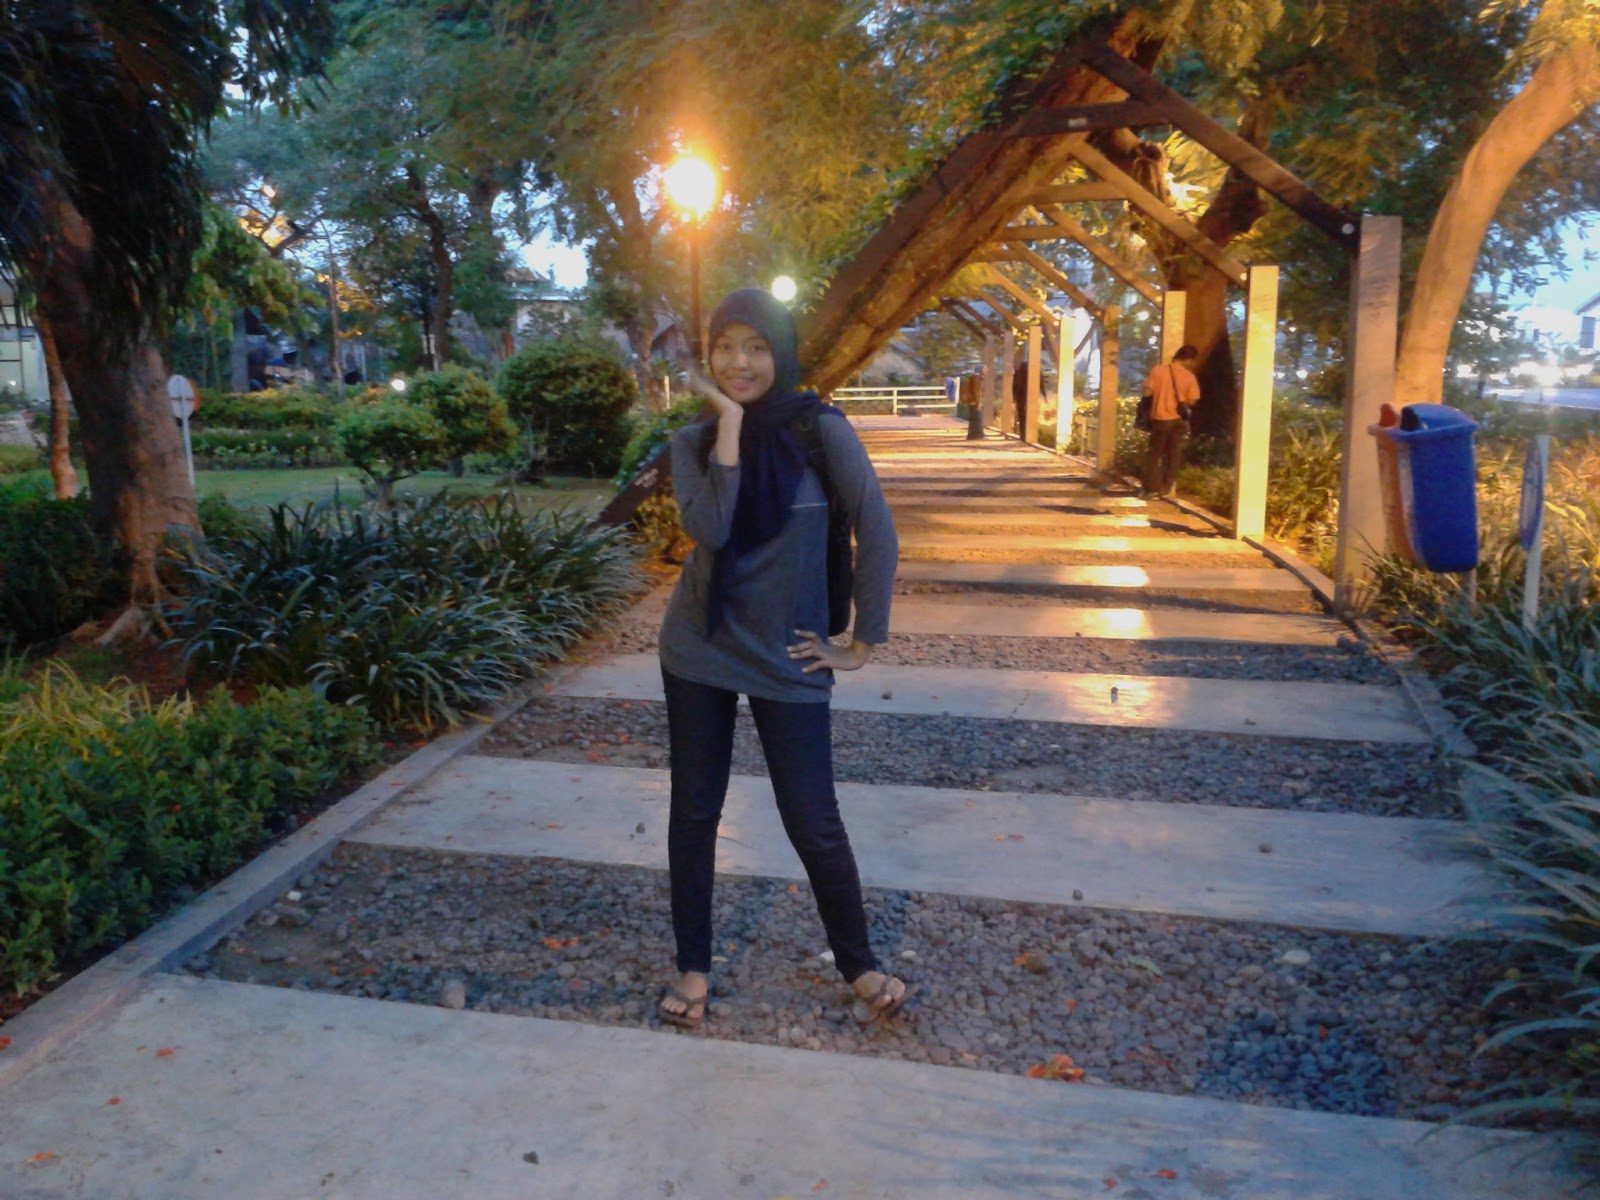 taman pelangi, taman pelangi surabaya, taman instagenic, kota surabaya, dolan dolen, dolaners taman pelangi surabaya via indah haya - Dolan Dolen